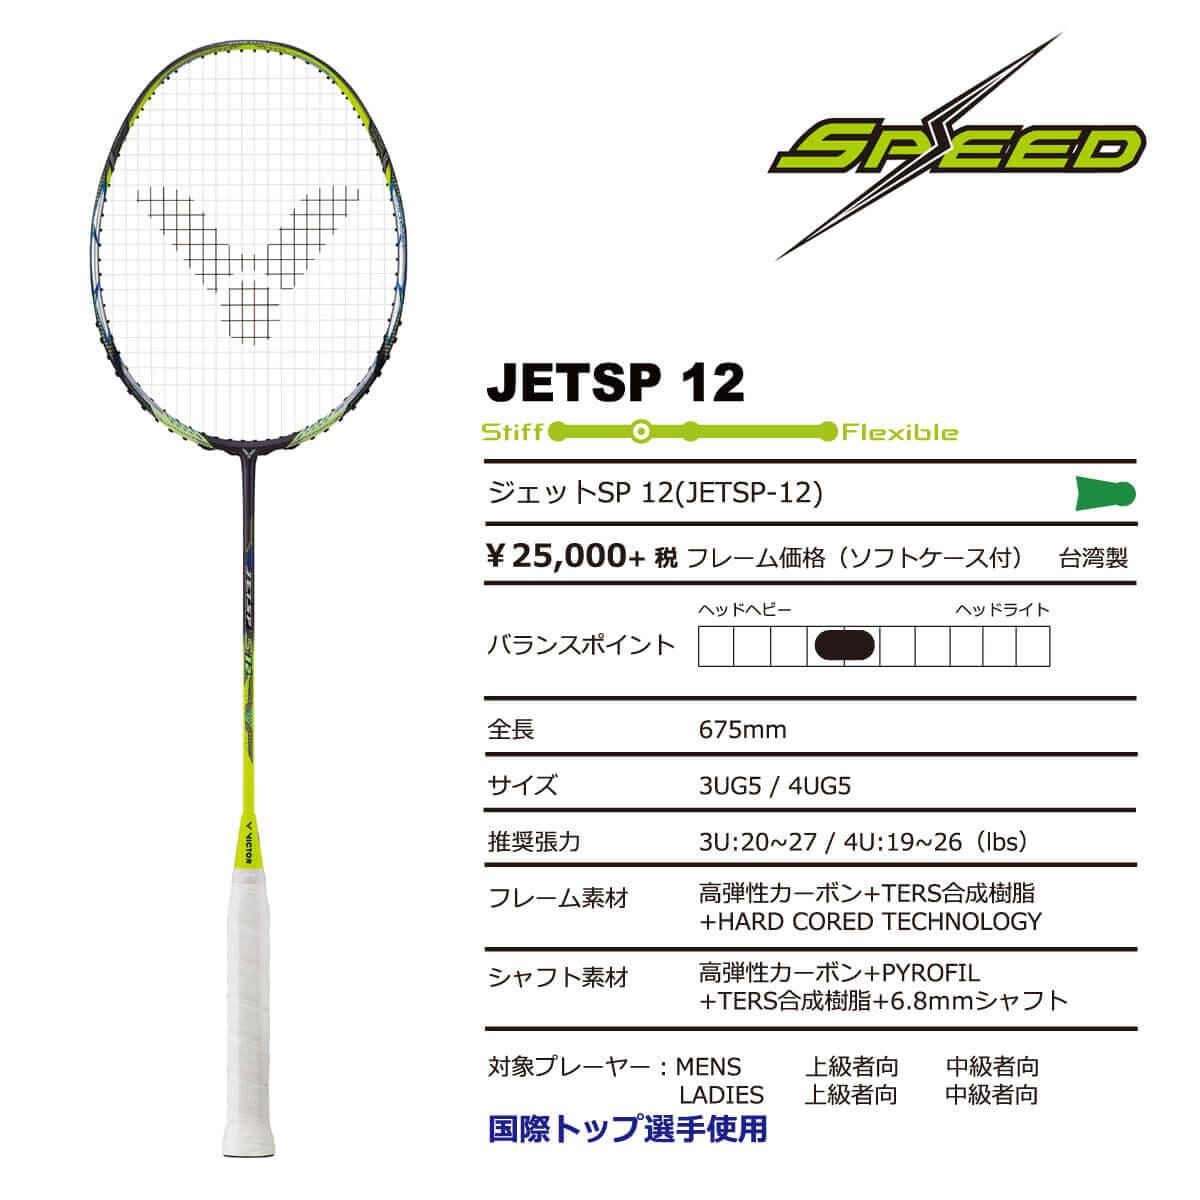 VICTOR JETSP 12 ジェットSP バドミントンラケット ビクター【日本バドミントン協会審査合格品/ 取り寄せ】